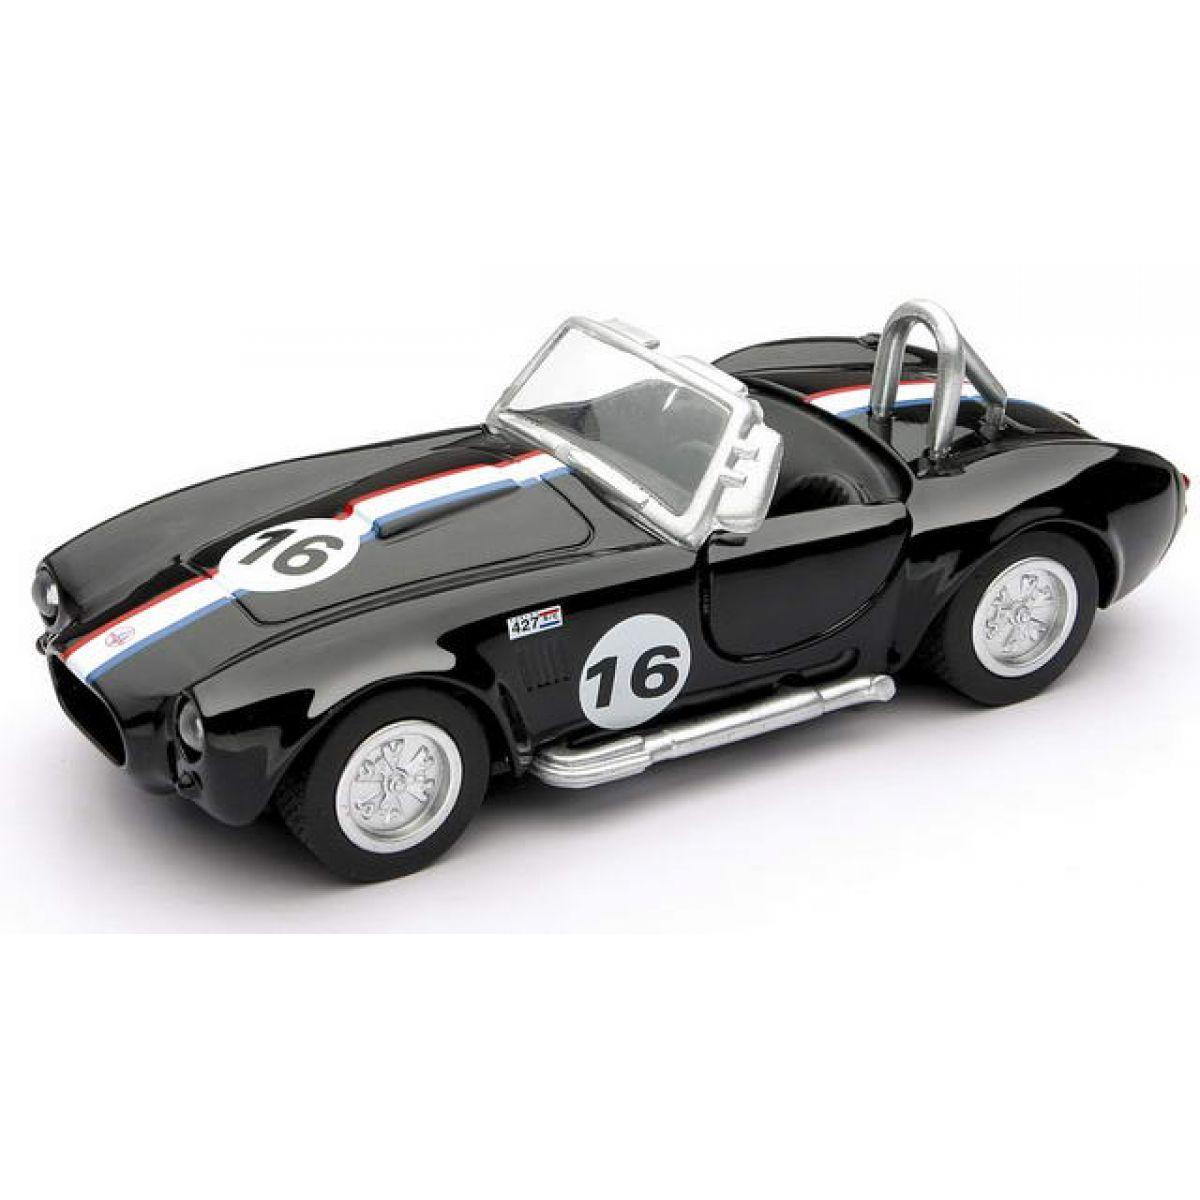 1:32 1966 Shelby Cobra 427 S/C